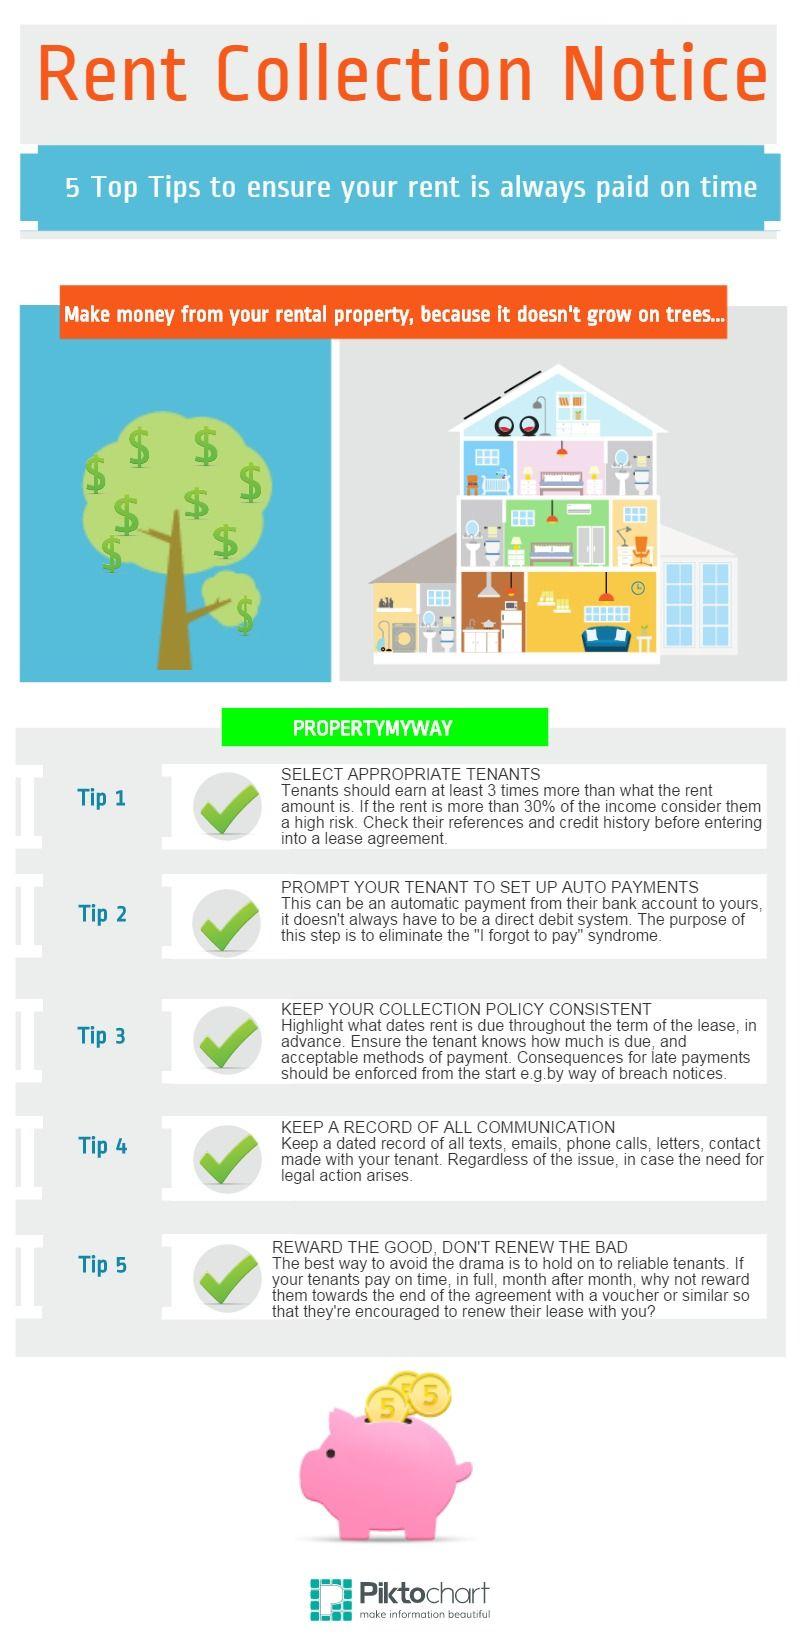 c205b315ece321d25572f25d28ea02f5 - How To Get A Rental With Bad Rental History